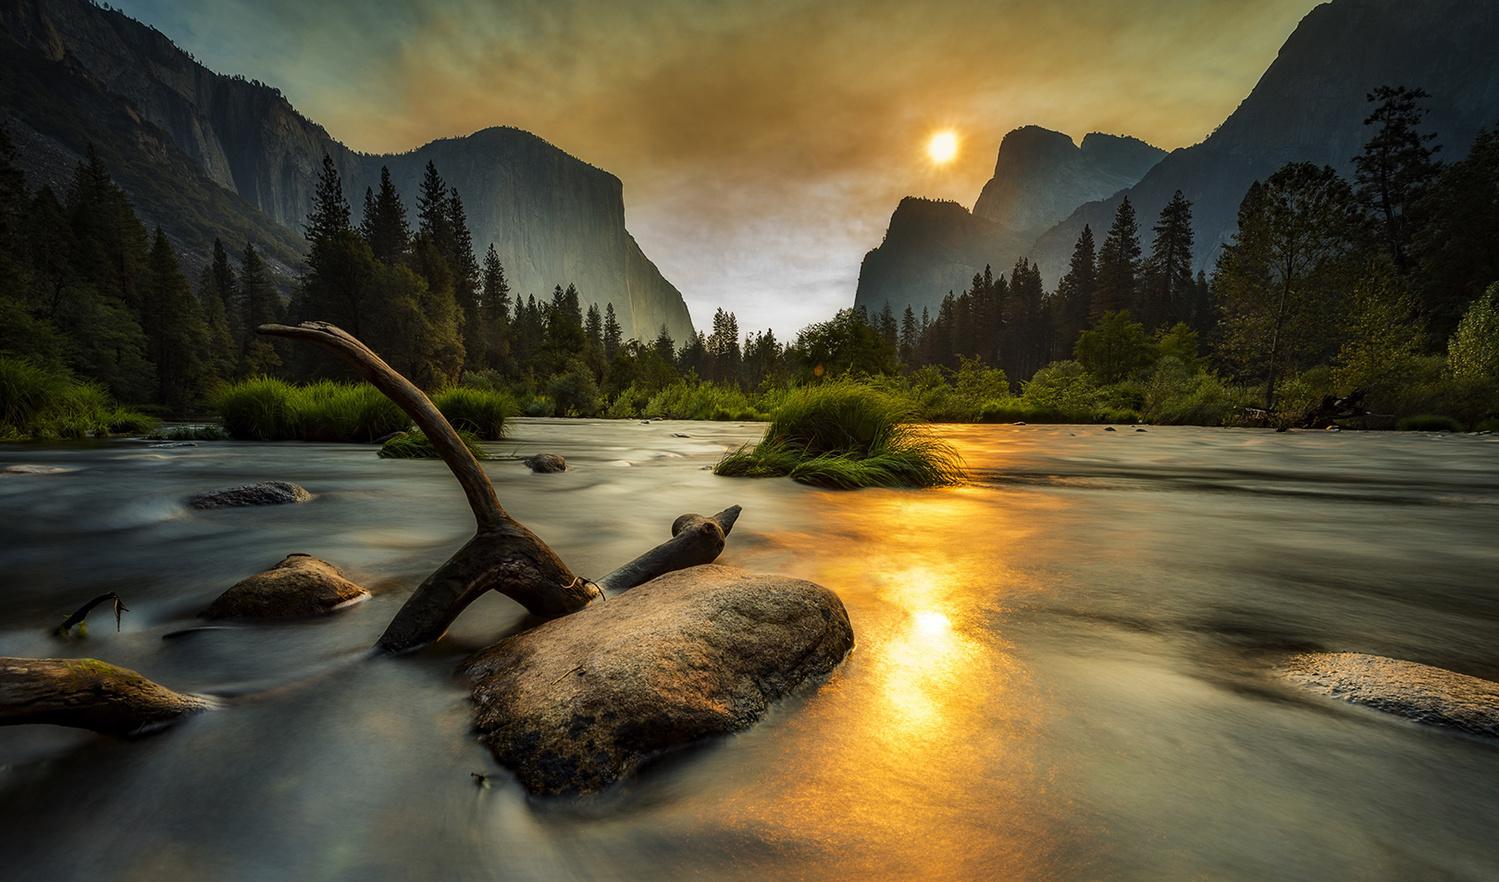 The Morning Burn Off by David Wilder